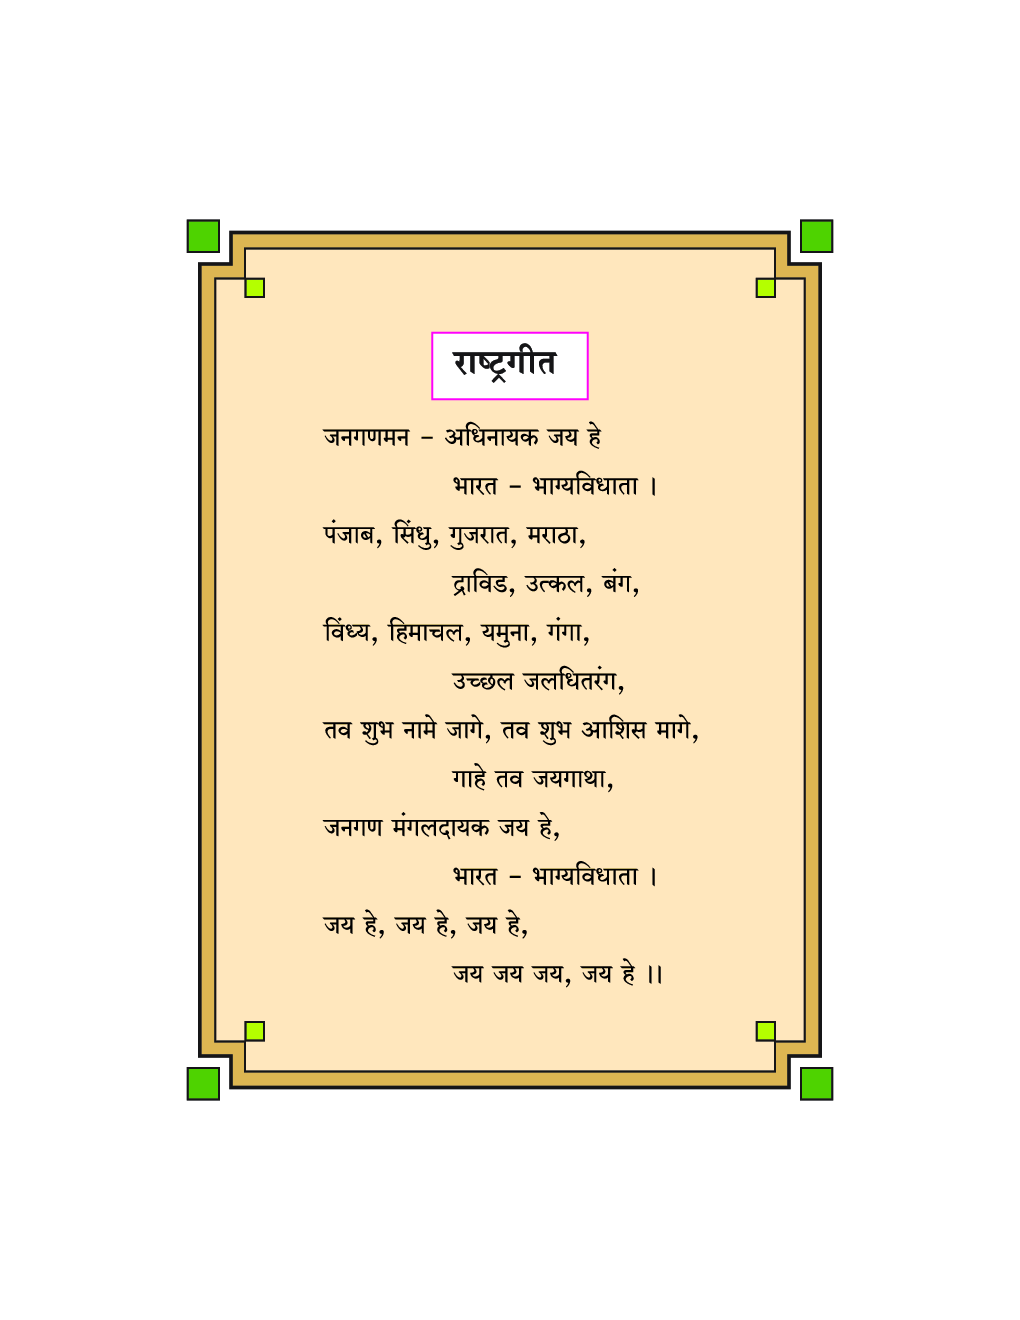 Maharashtra School Textbook बालभारती For Class-4 - Page 5